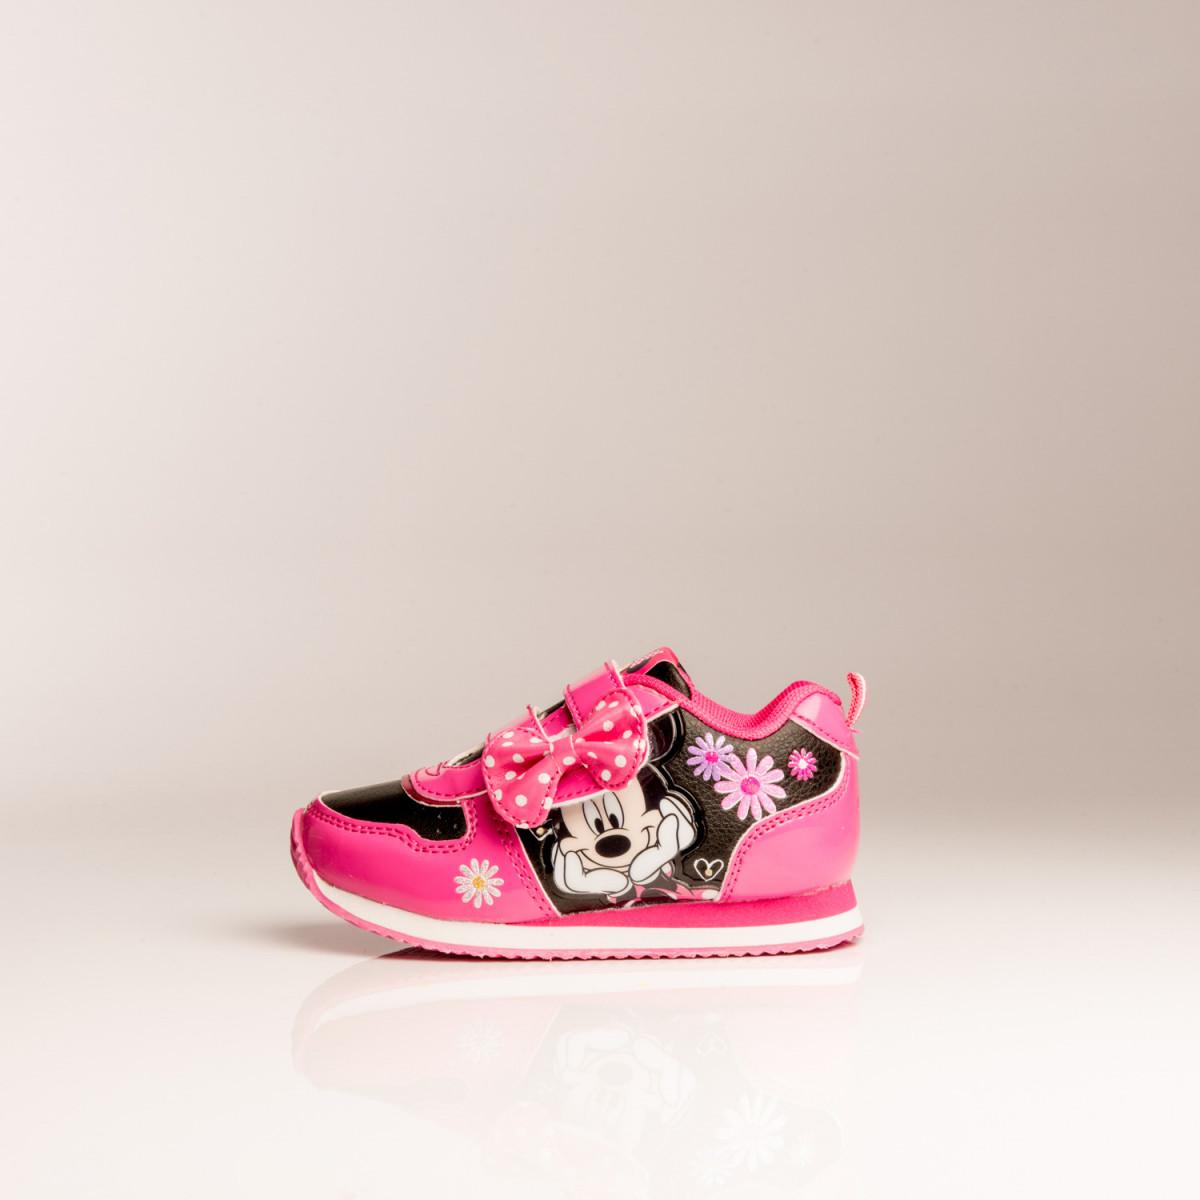 Zapatillas Disney Running Minnie